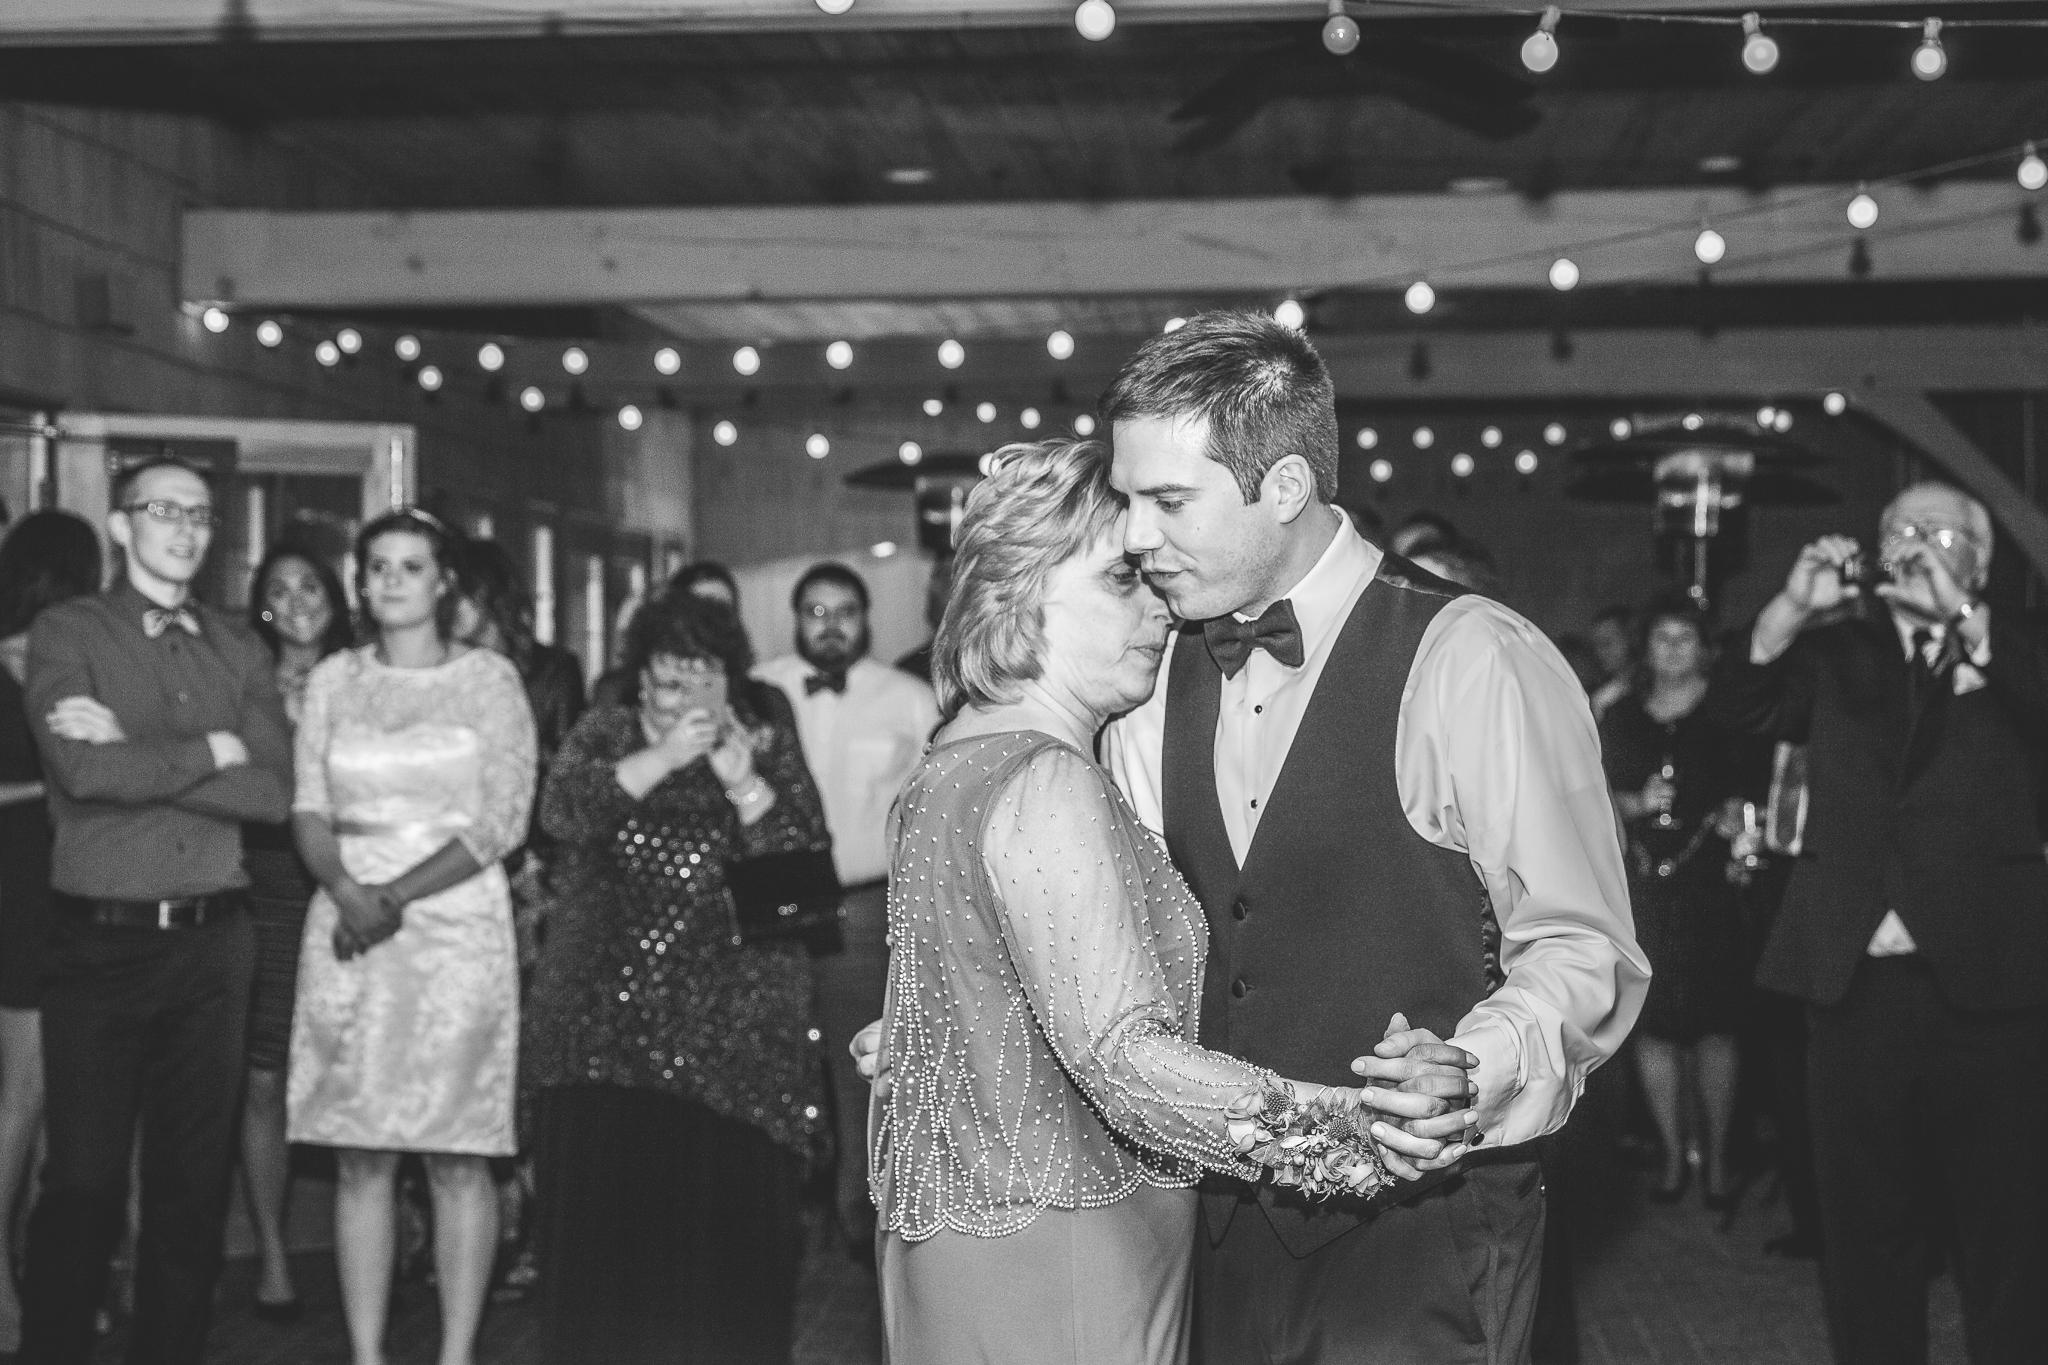 camuglia-whomstudio-chelsea_and_andy-nycphotographer-wedding-brooklyn-buffalo-timberlodge-126-0784.jpg